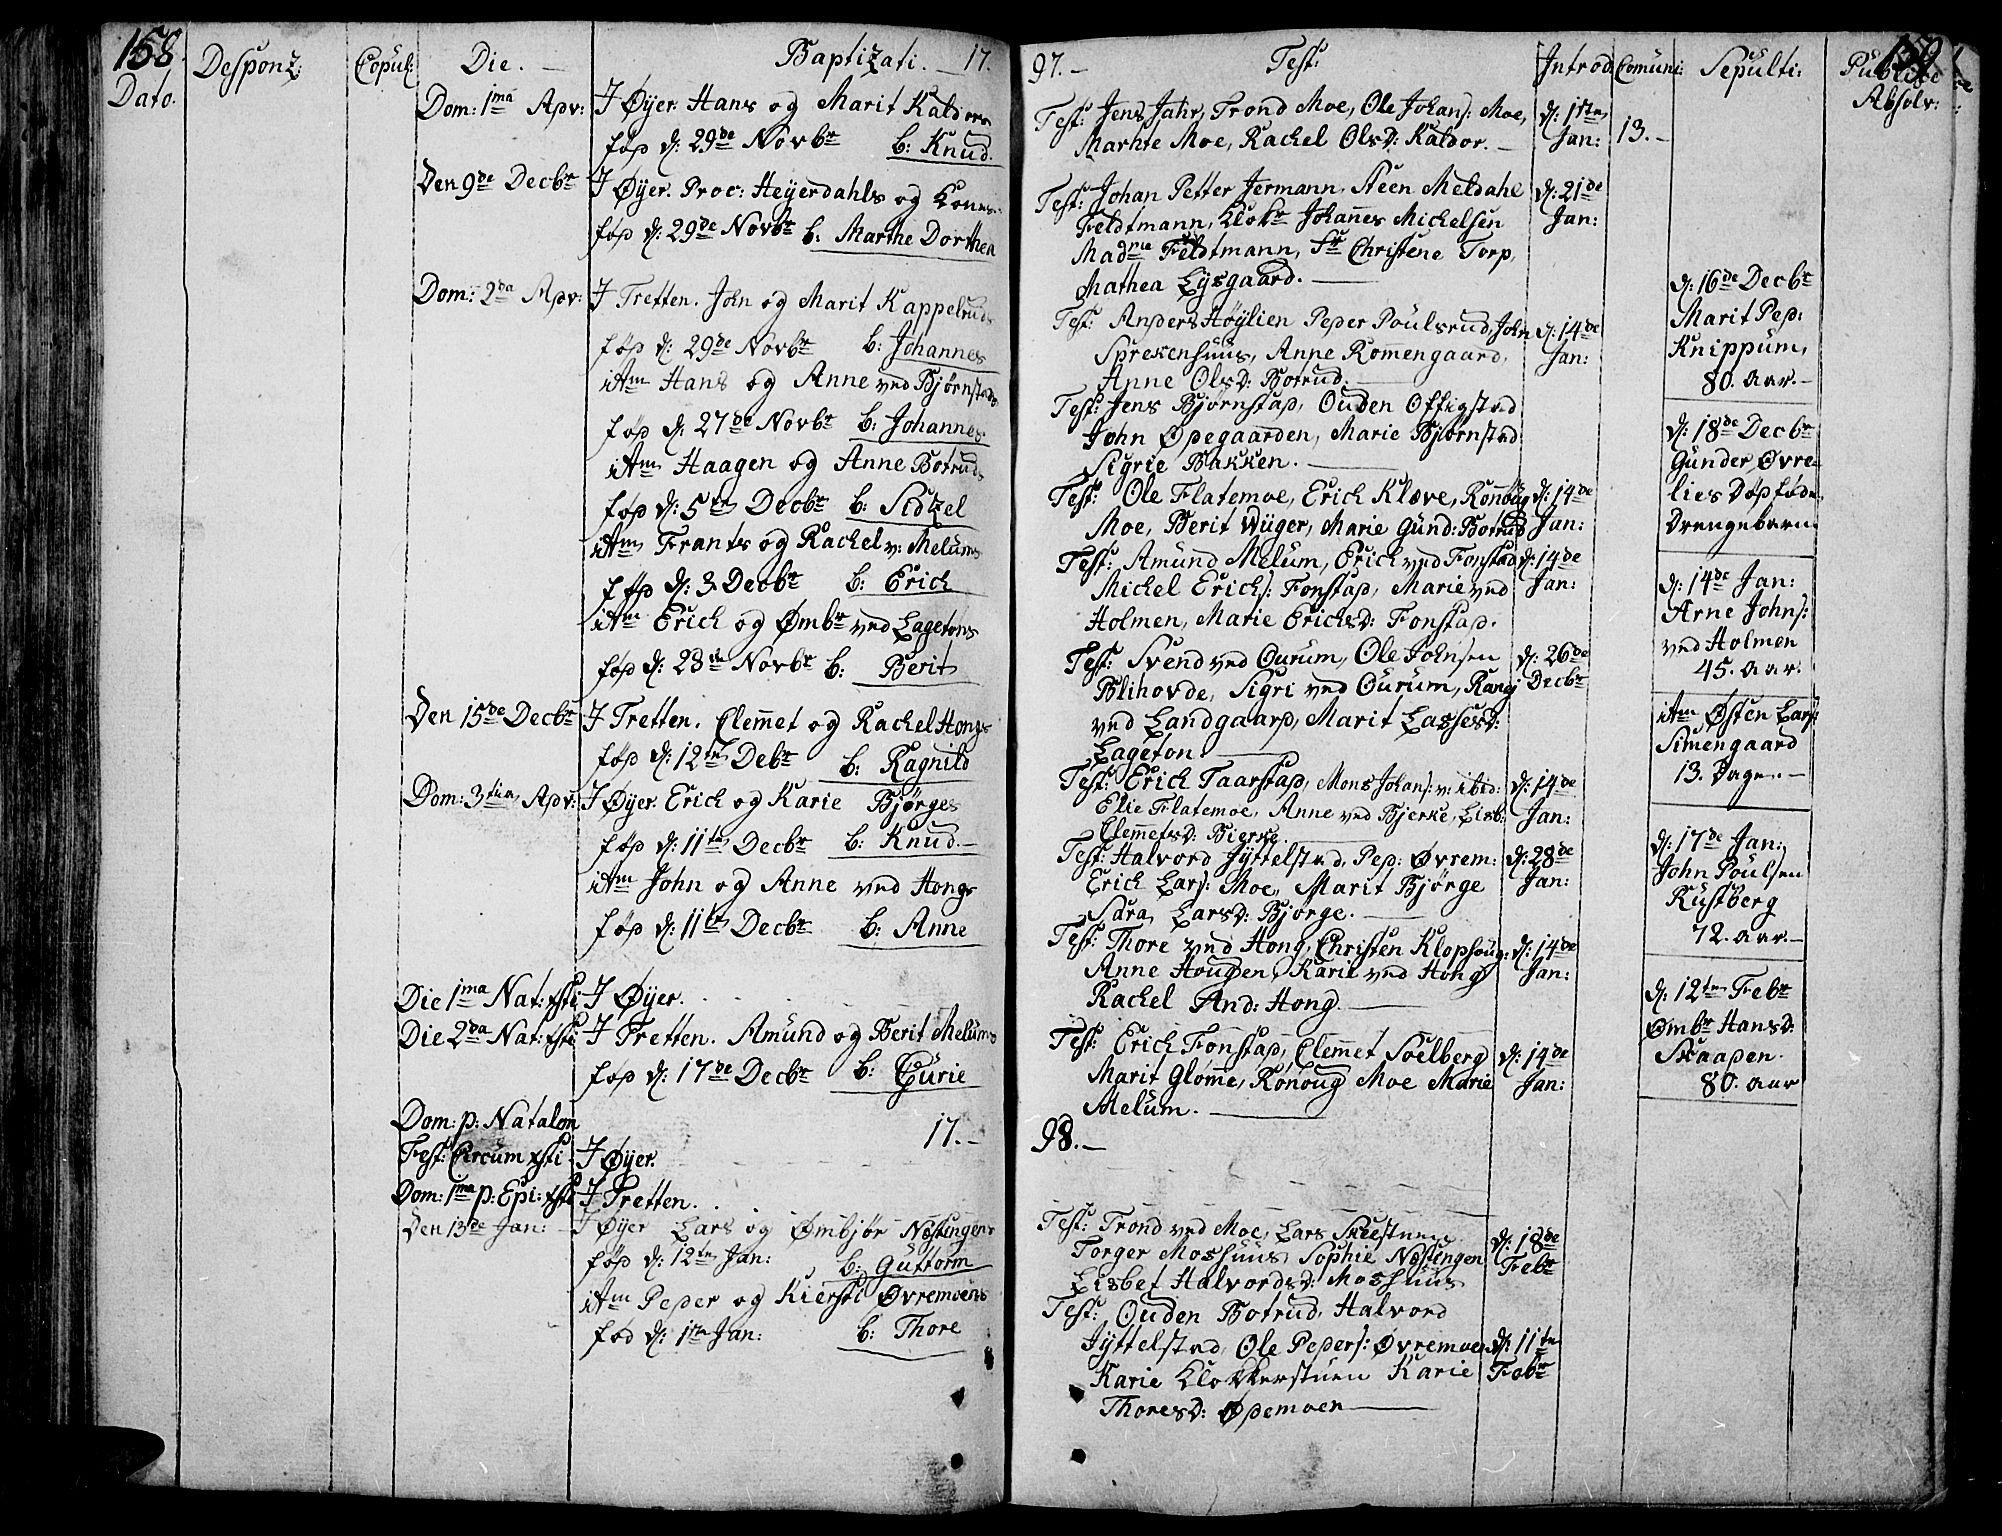 SAH, Øyer prestekontor, Ministerialbok nr. 3, 1784-1824, s. 158-159